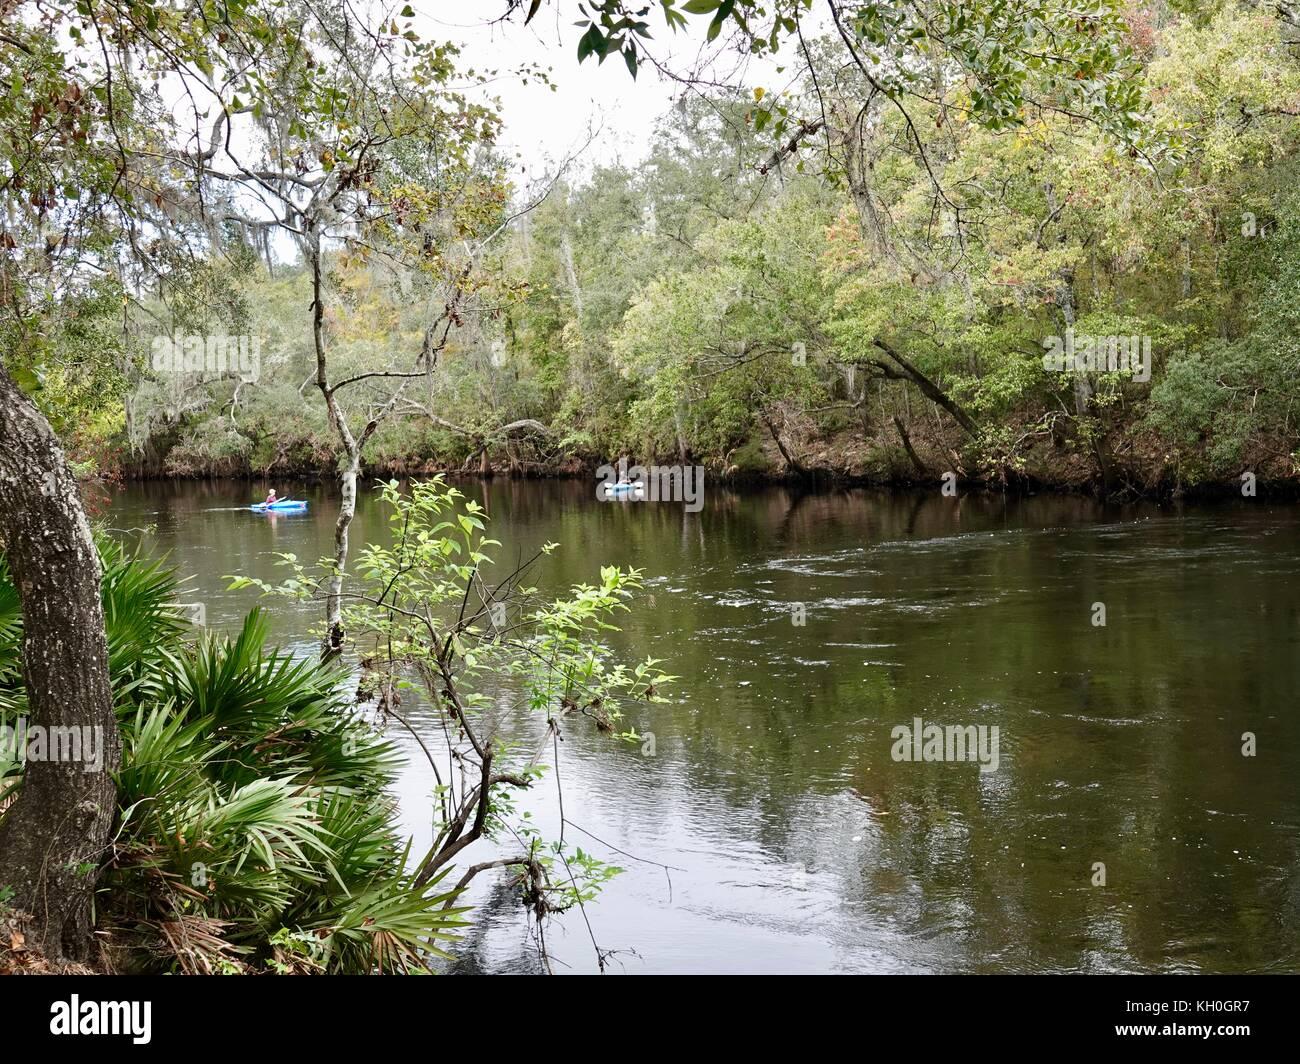 Santa fe river stock photos santa fe river stock images for Fishing in gainesville fl